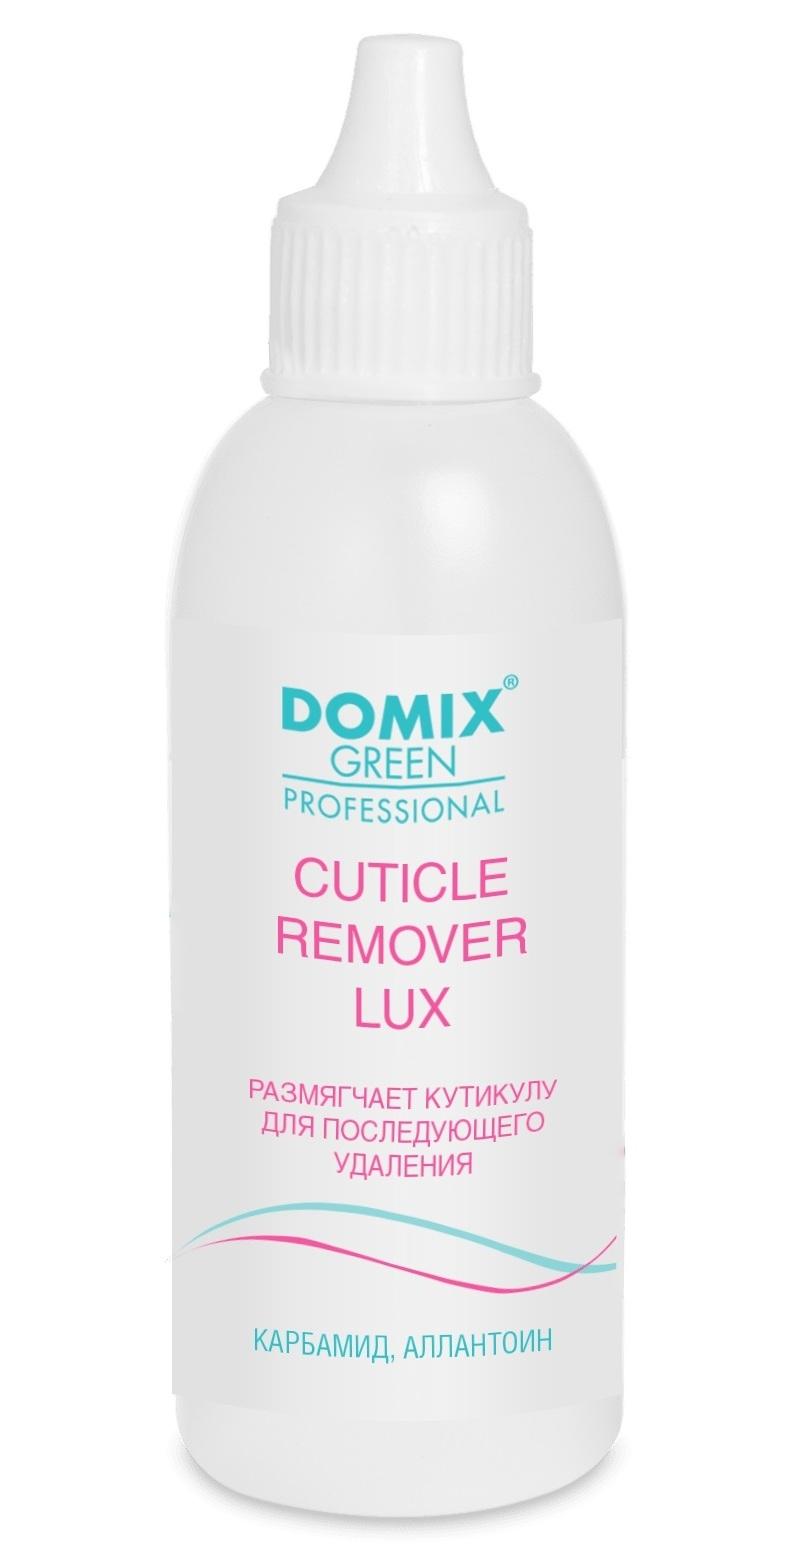 Domix Средство Cuticle Remover Lux для Размягчения и Удаления Кутикулы, 113 мл цена в Москве и Питере